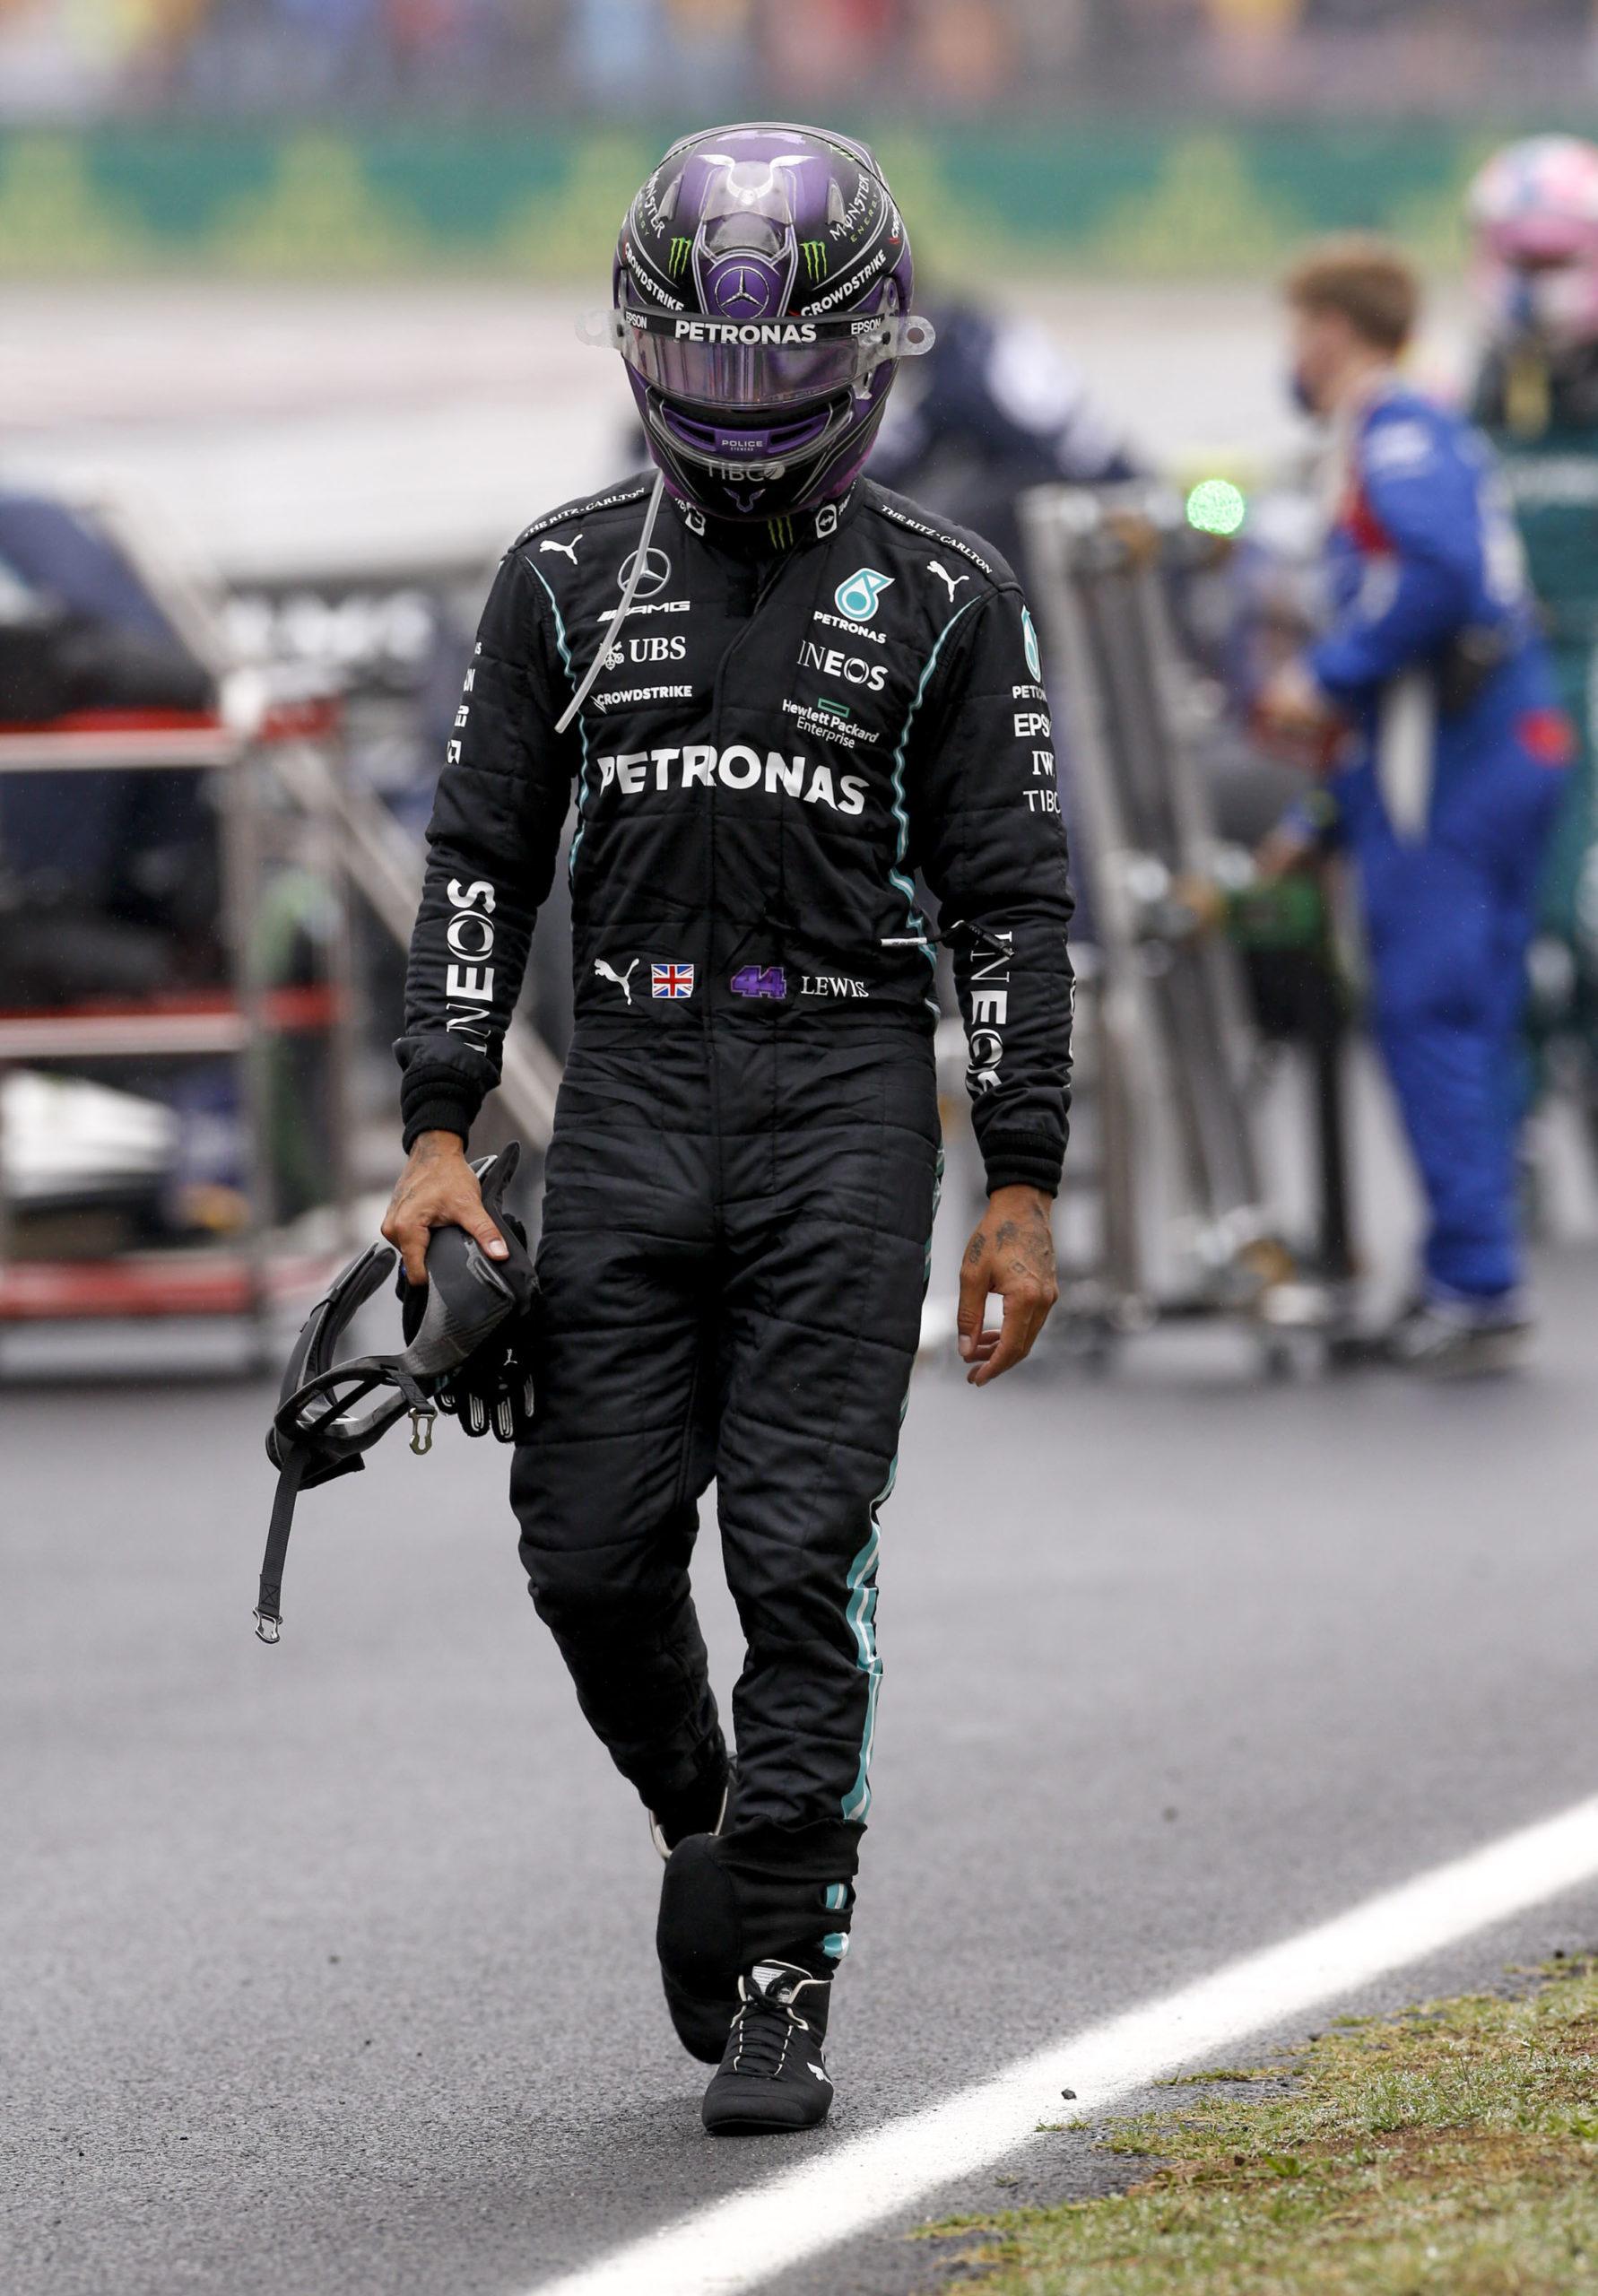 Lewis-Hamilton-walks-with-helmet-on-after-the-2021-Turkish-Grand-Prix